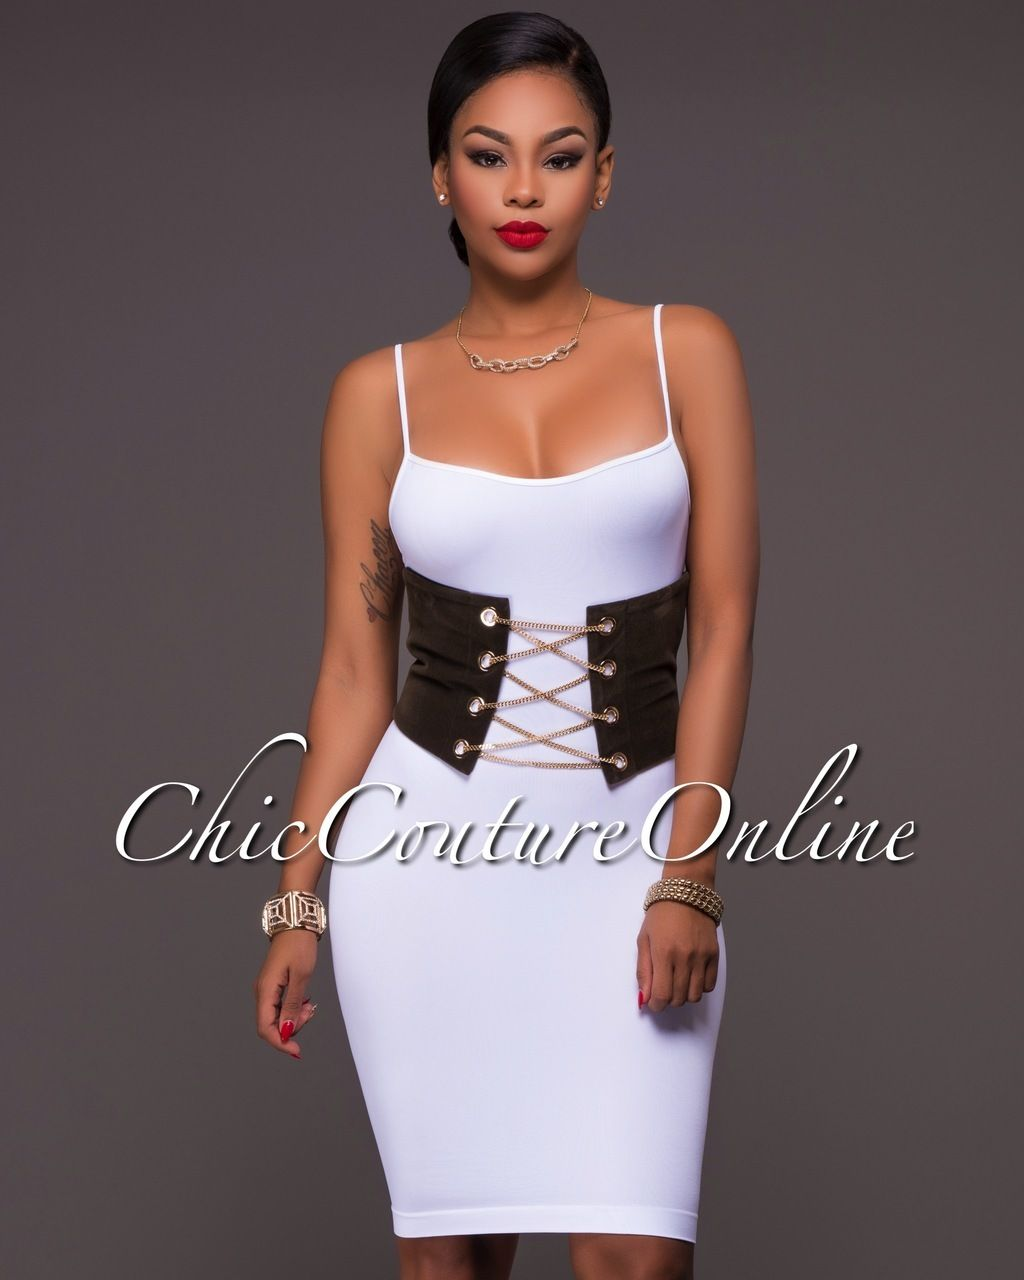 Chic Couture Online - Elektra Olive Green Velvet Gold Accent Corset Belt, $45.00 (http://www.chiccoutureonline.com/elektra-olive-green-velvet-gold-accent-corset-belt/)